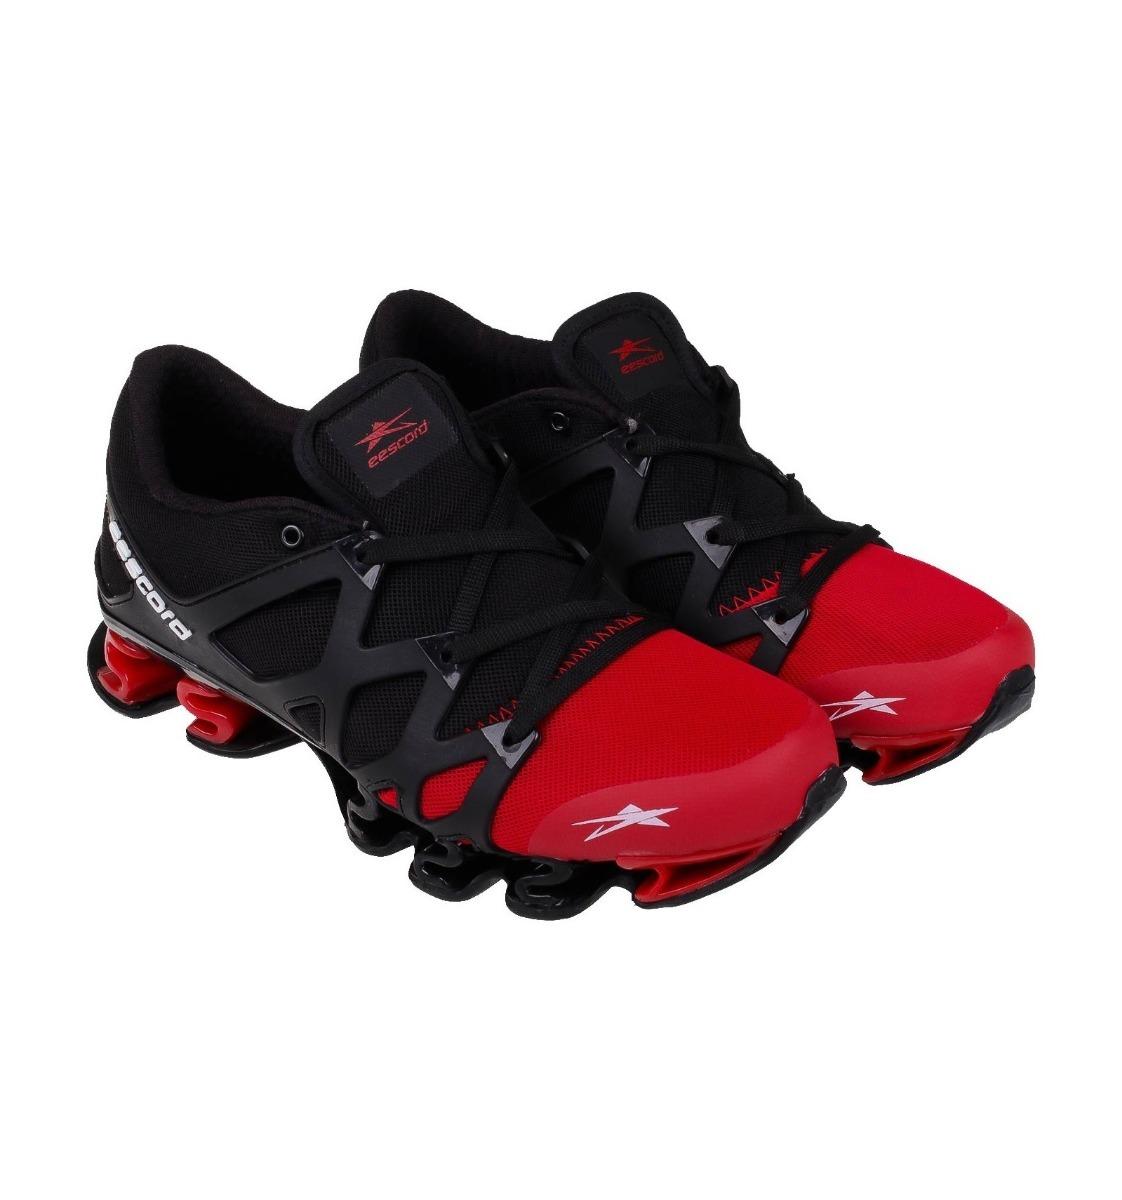 cheap for discount ce922 7c67e Bofo Chivas cheap air sneaker 82012 e7c54 Tenis Eescord Para Correr Rojo ...